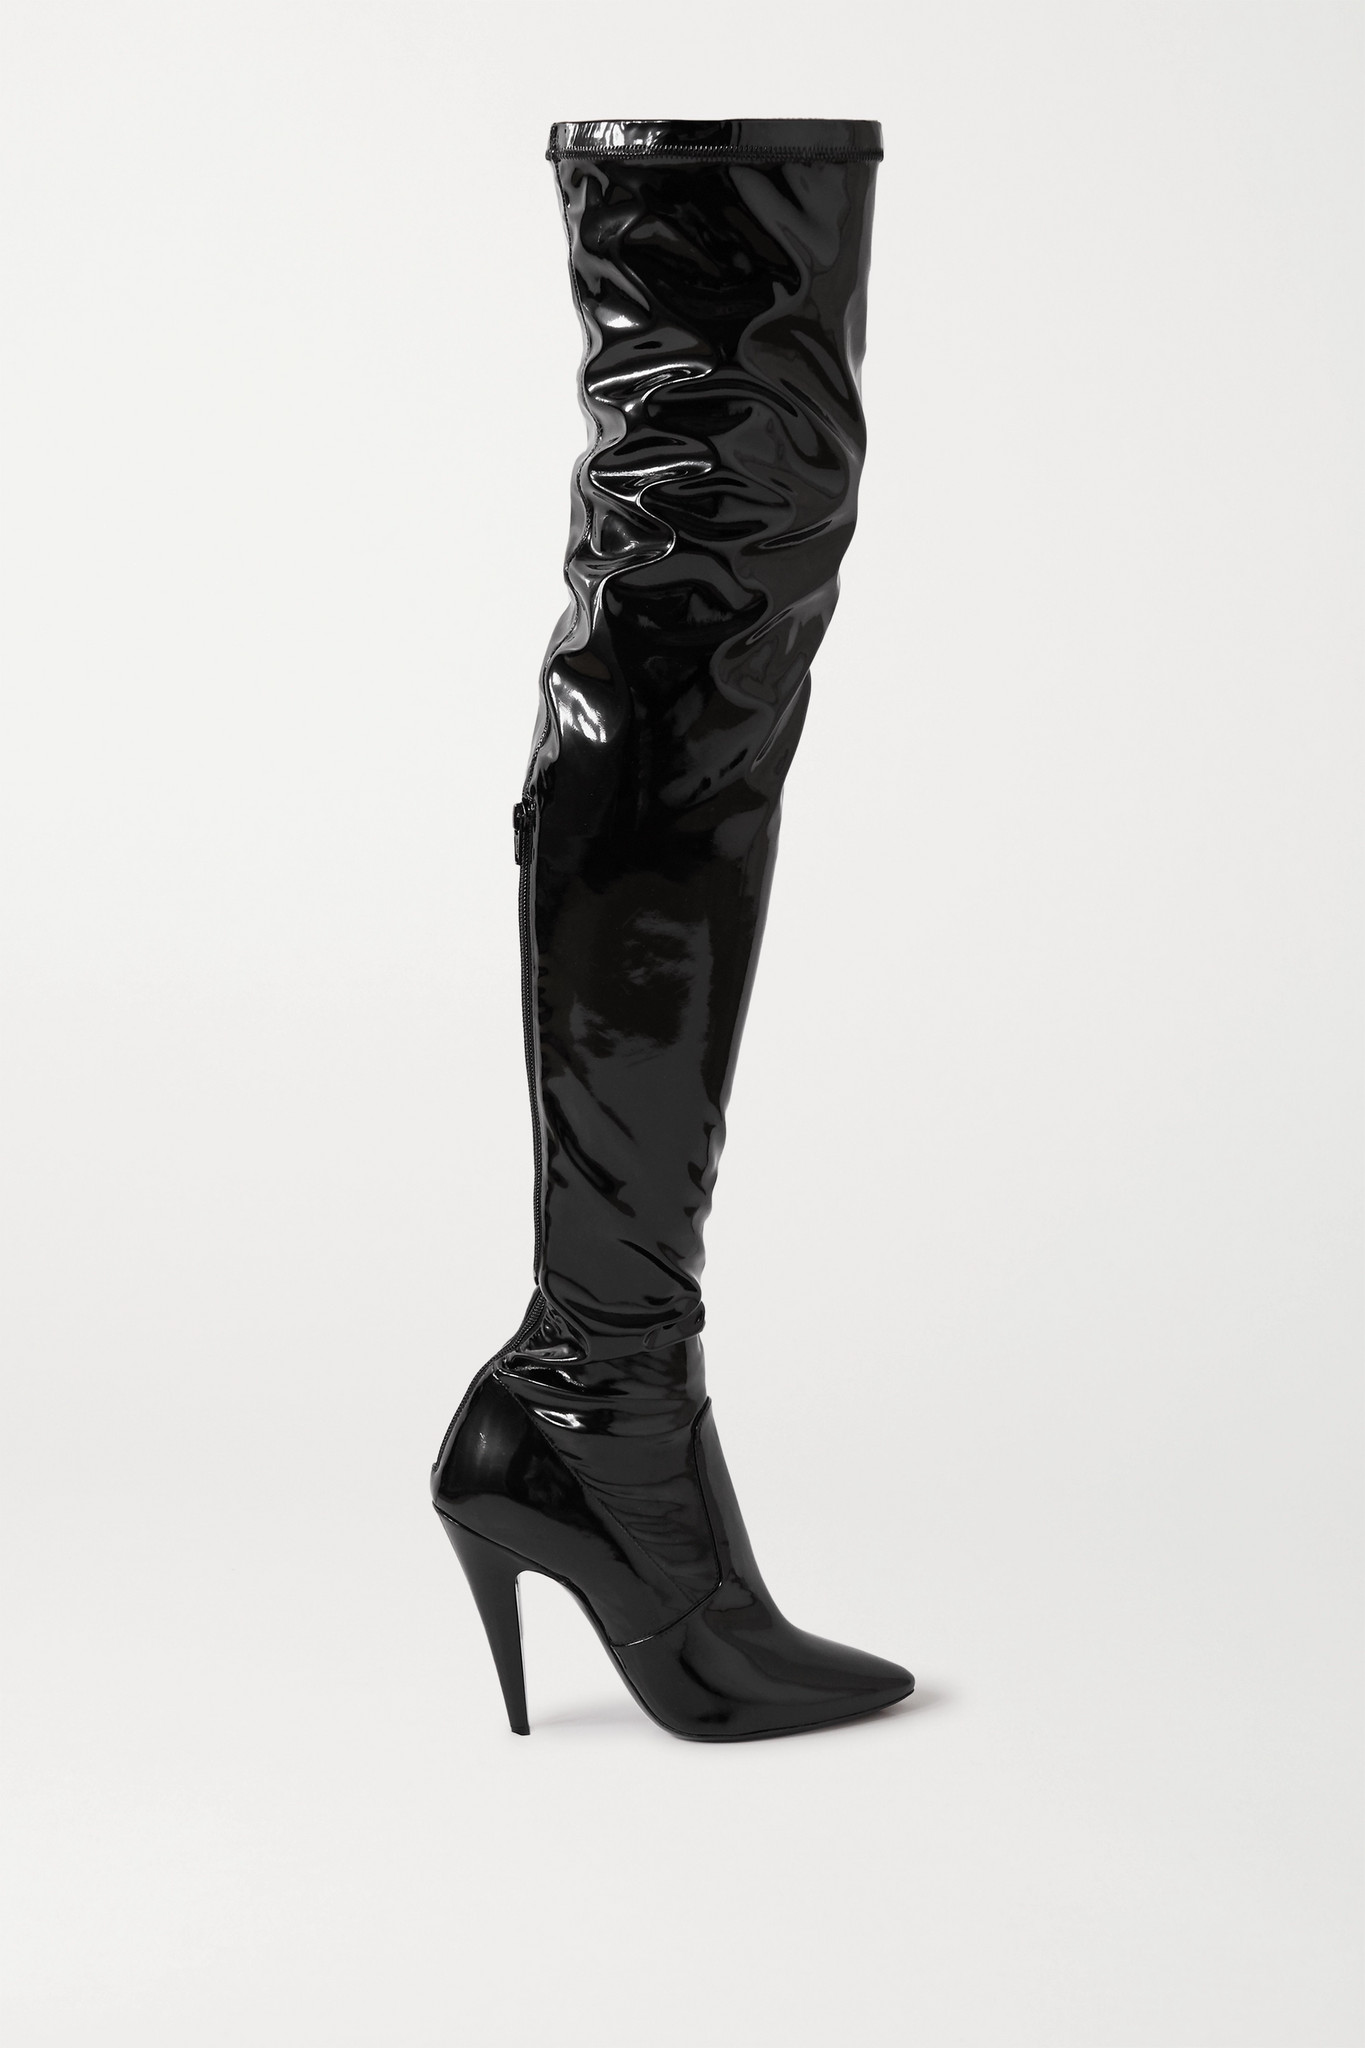 SAINT LAURENT - Faux Patent-leather Over-the-knee Boots - Black - IT40